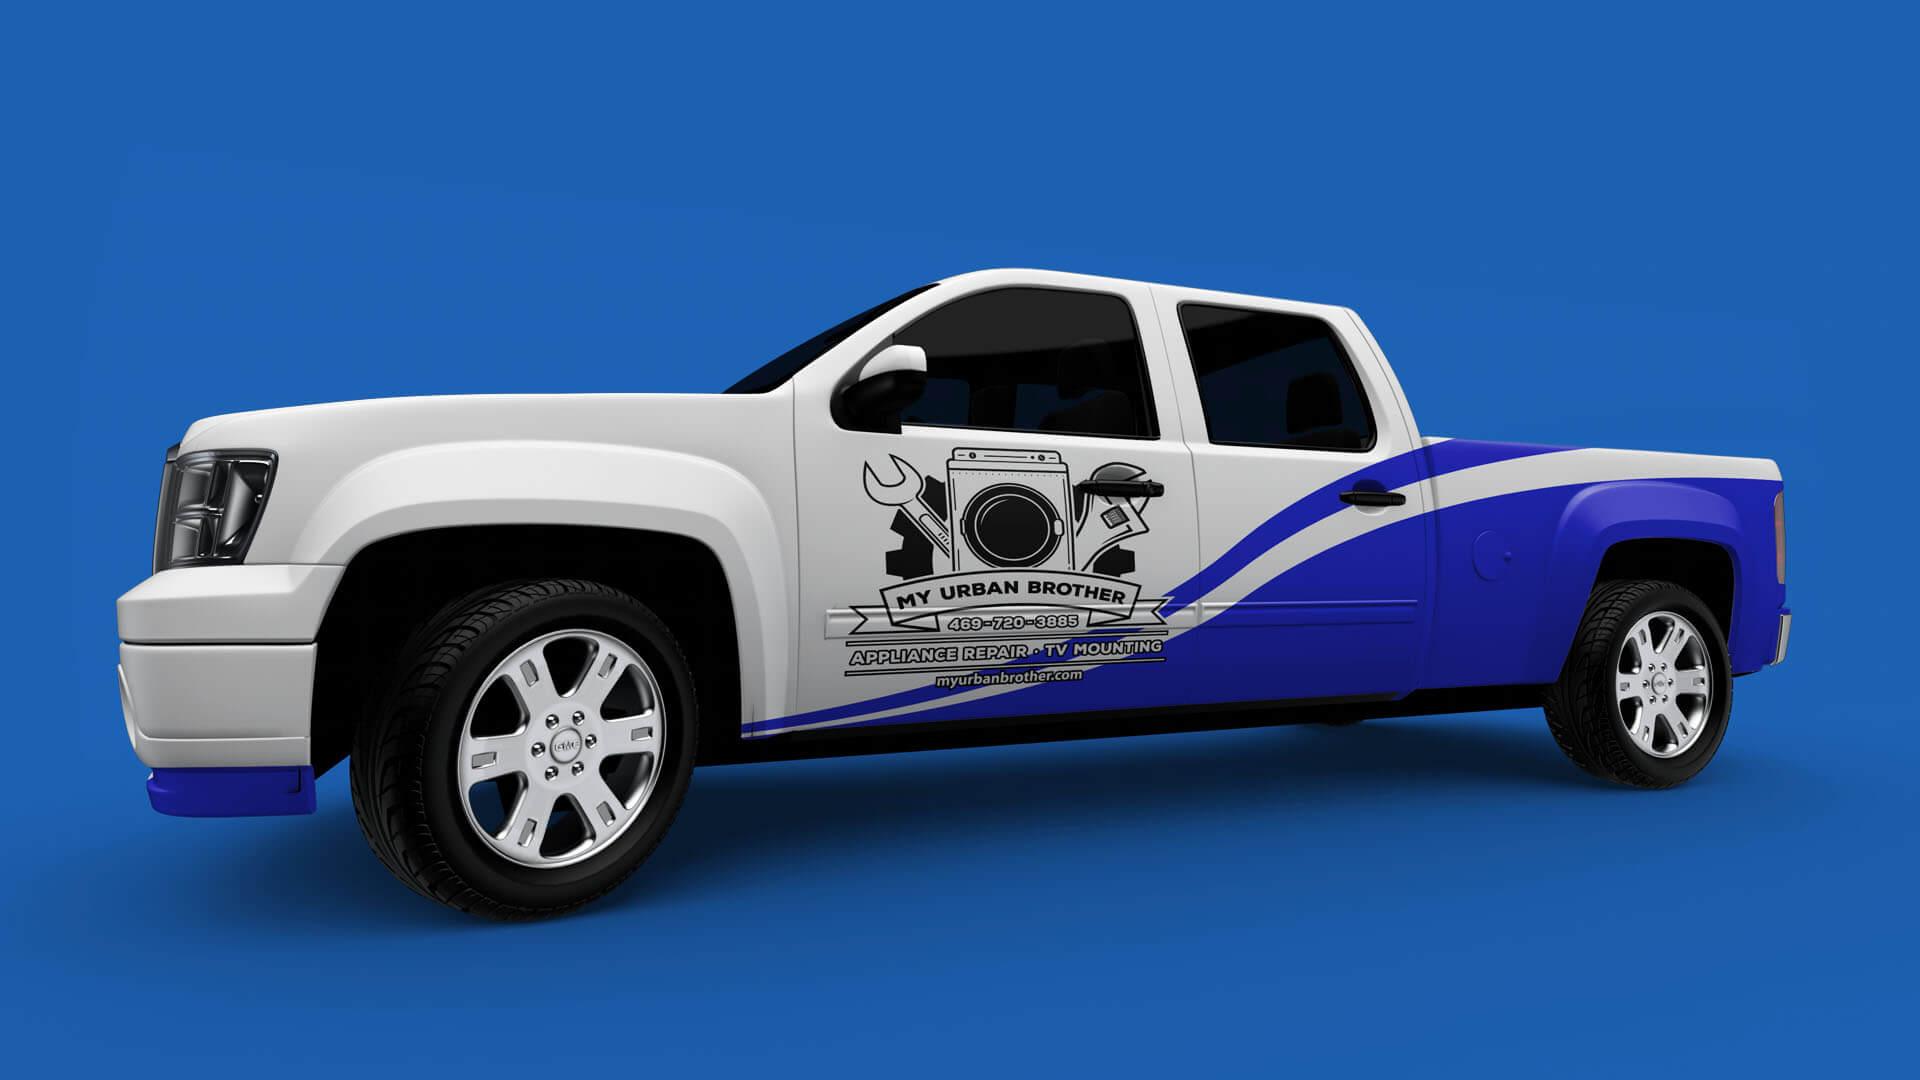 Urban Brother vehicle wrap